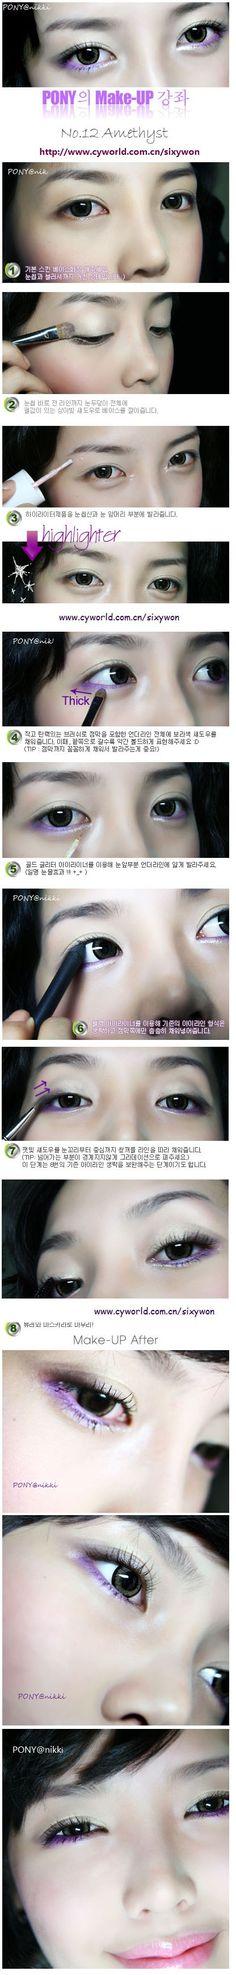 Korean-style makeup highlights. http://img529.imageshack.us/img529/5791/ponyamethystwn1.jpg